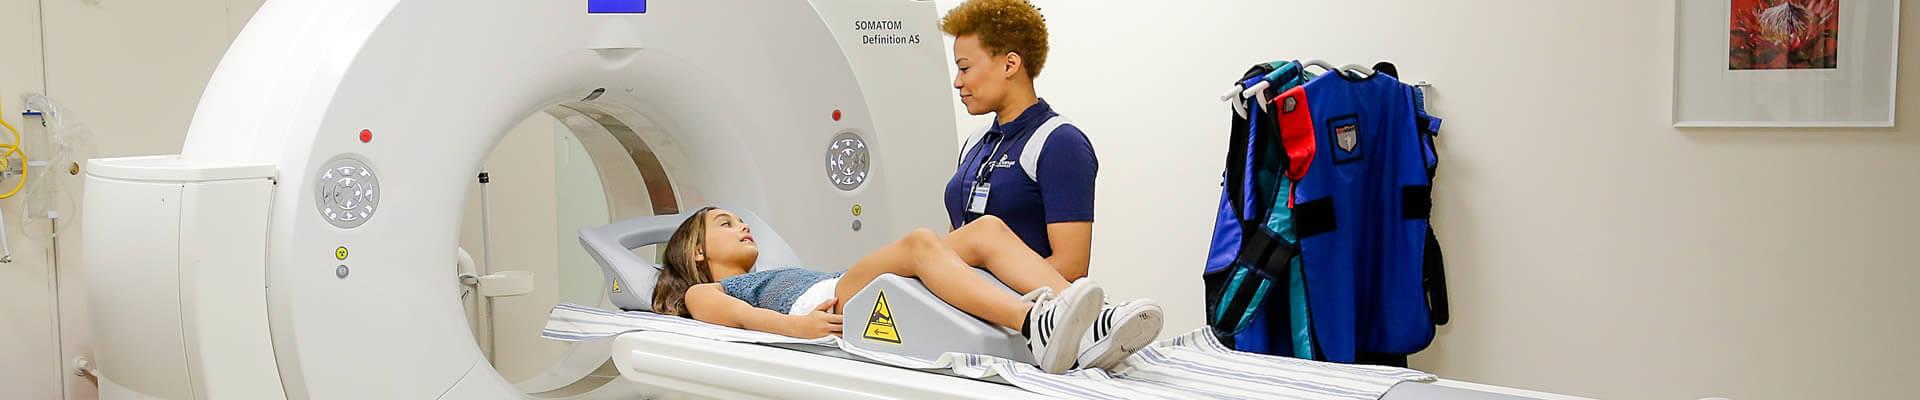 promovex banner - Porta para Radioterapia